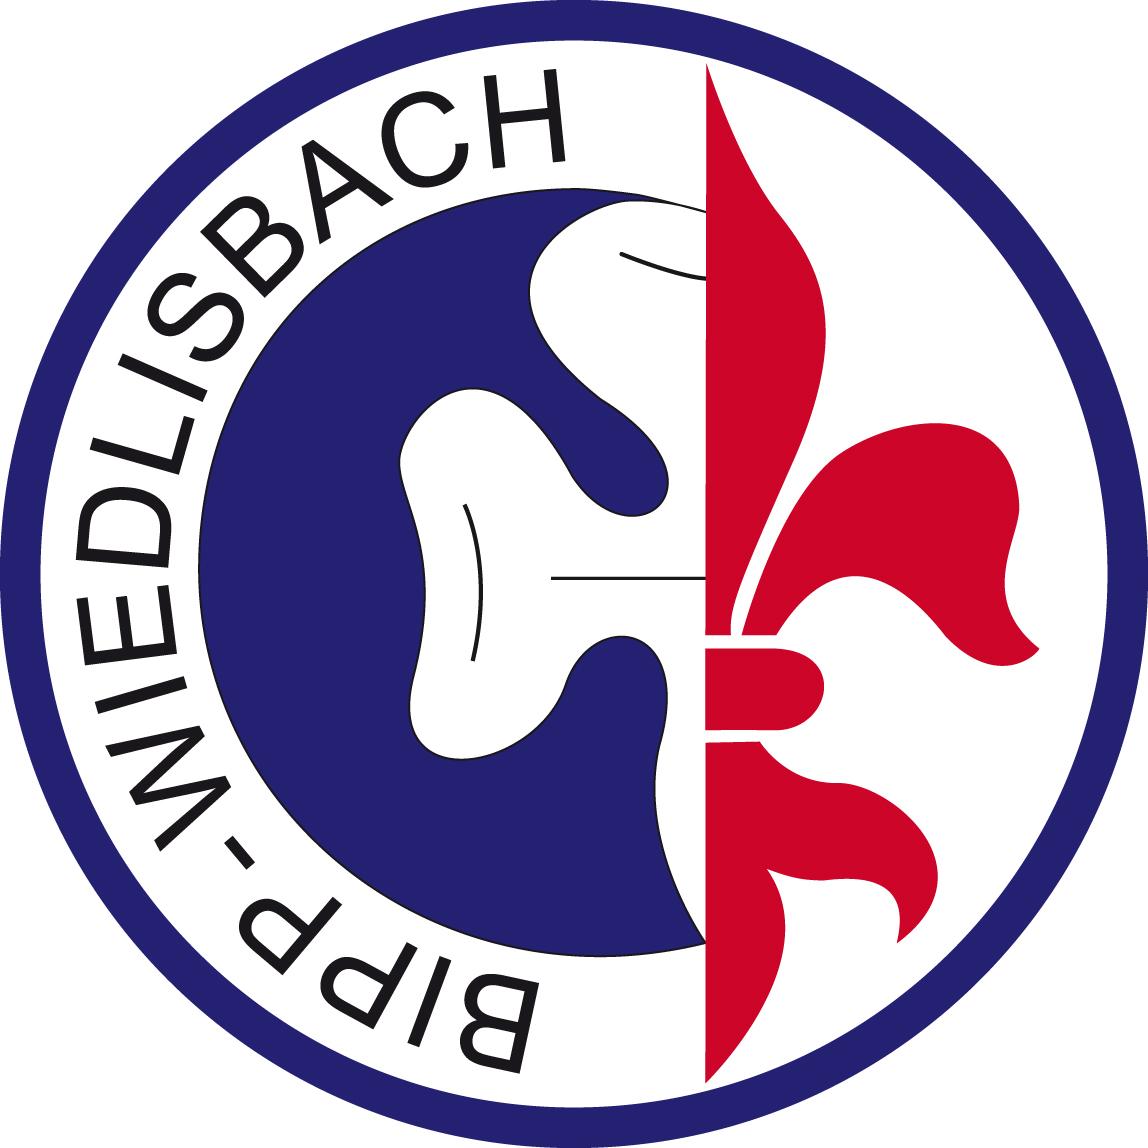 Pfadi Bipp-Wiedlisbach